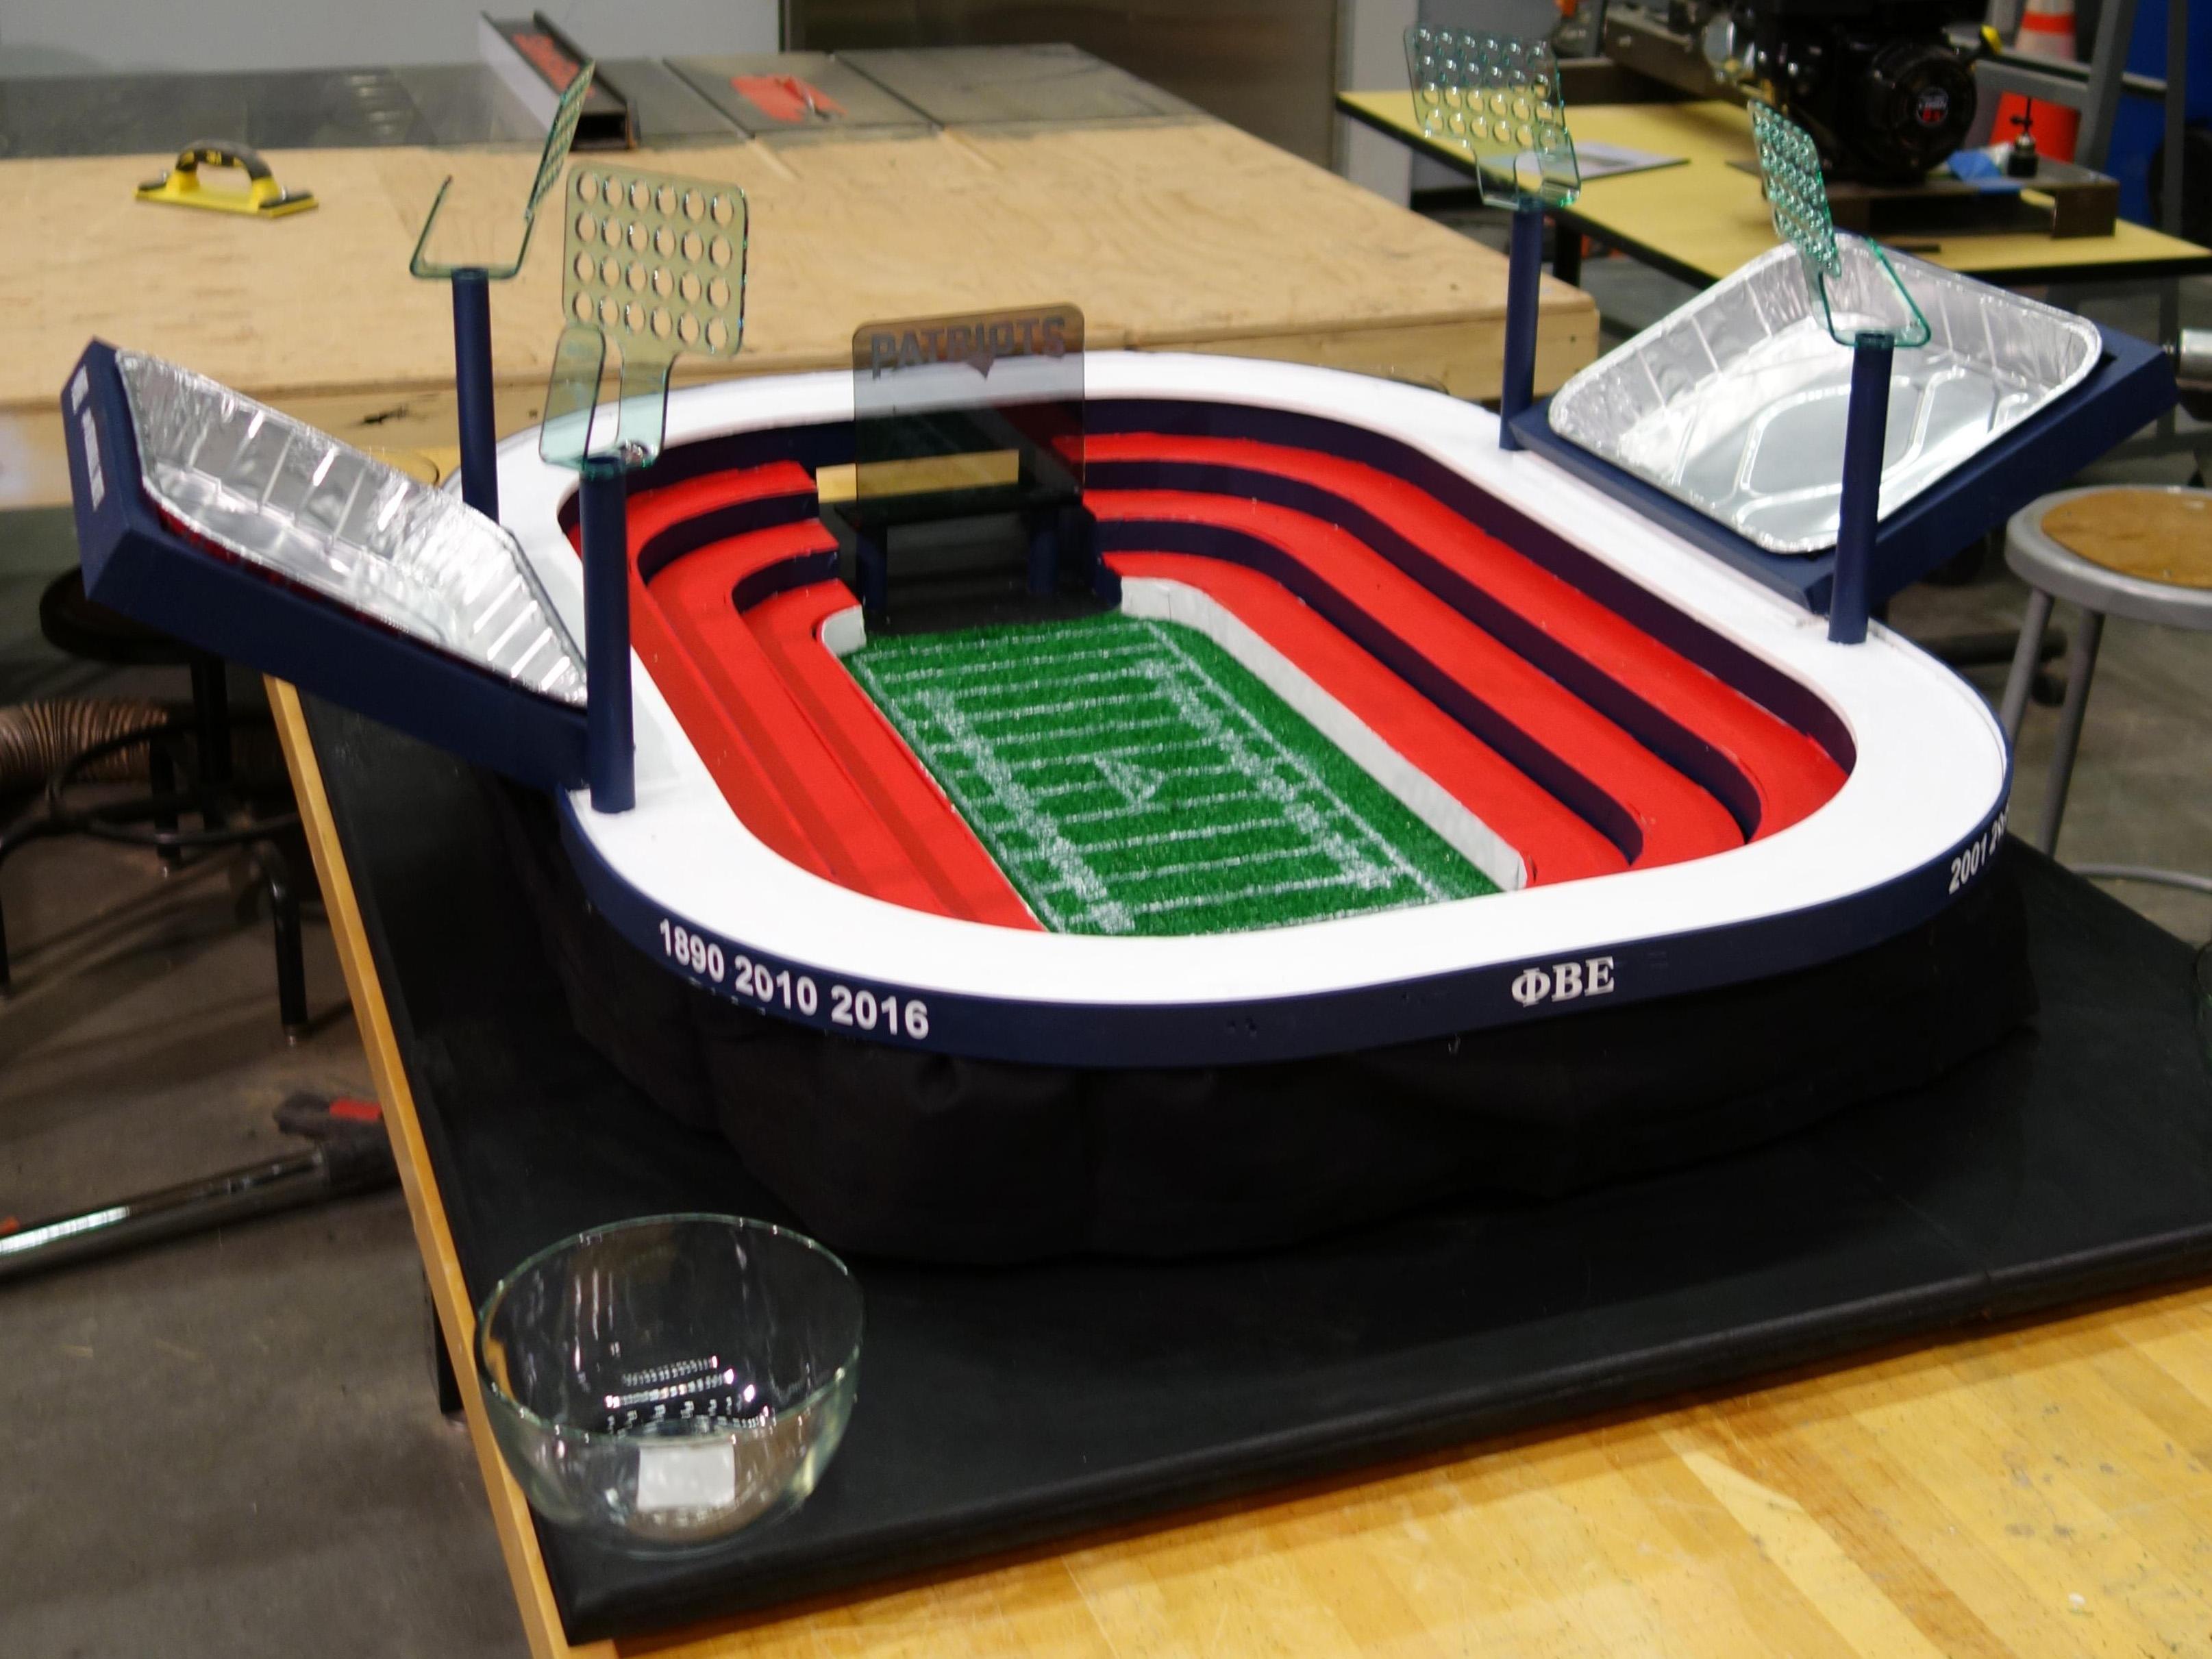 Pats Fan Builds Mini Stadium for Super Bowl Spread